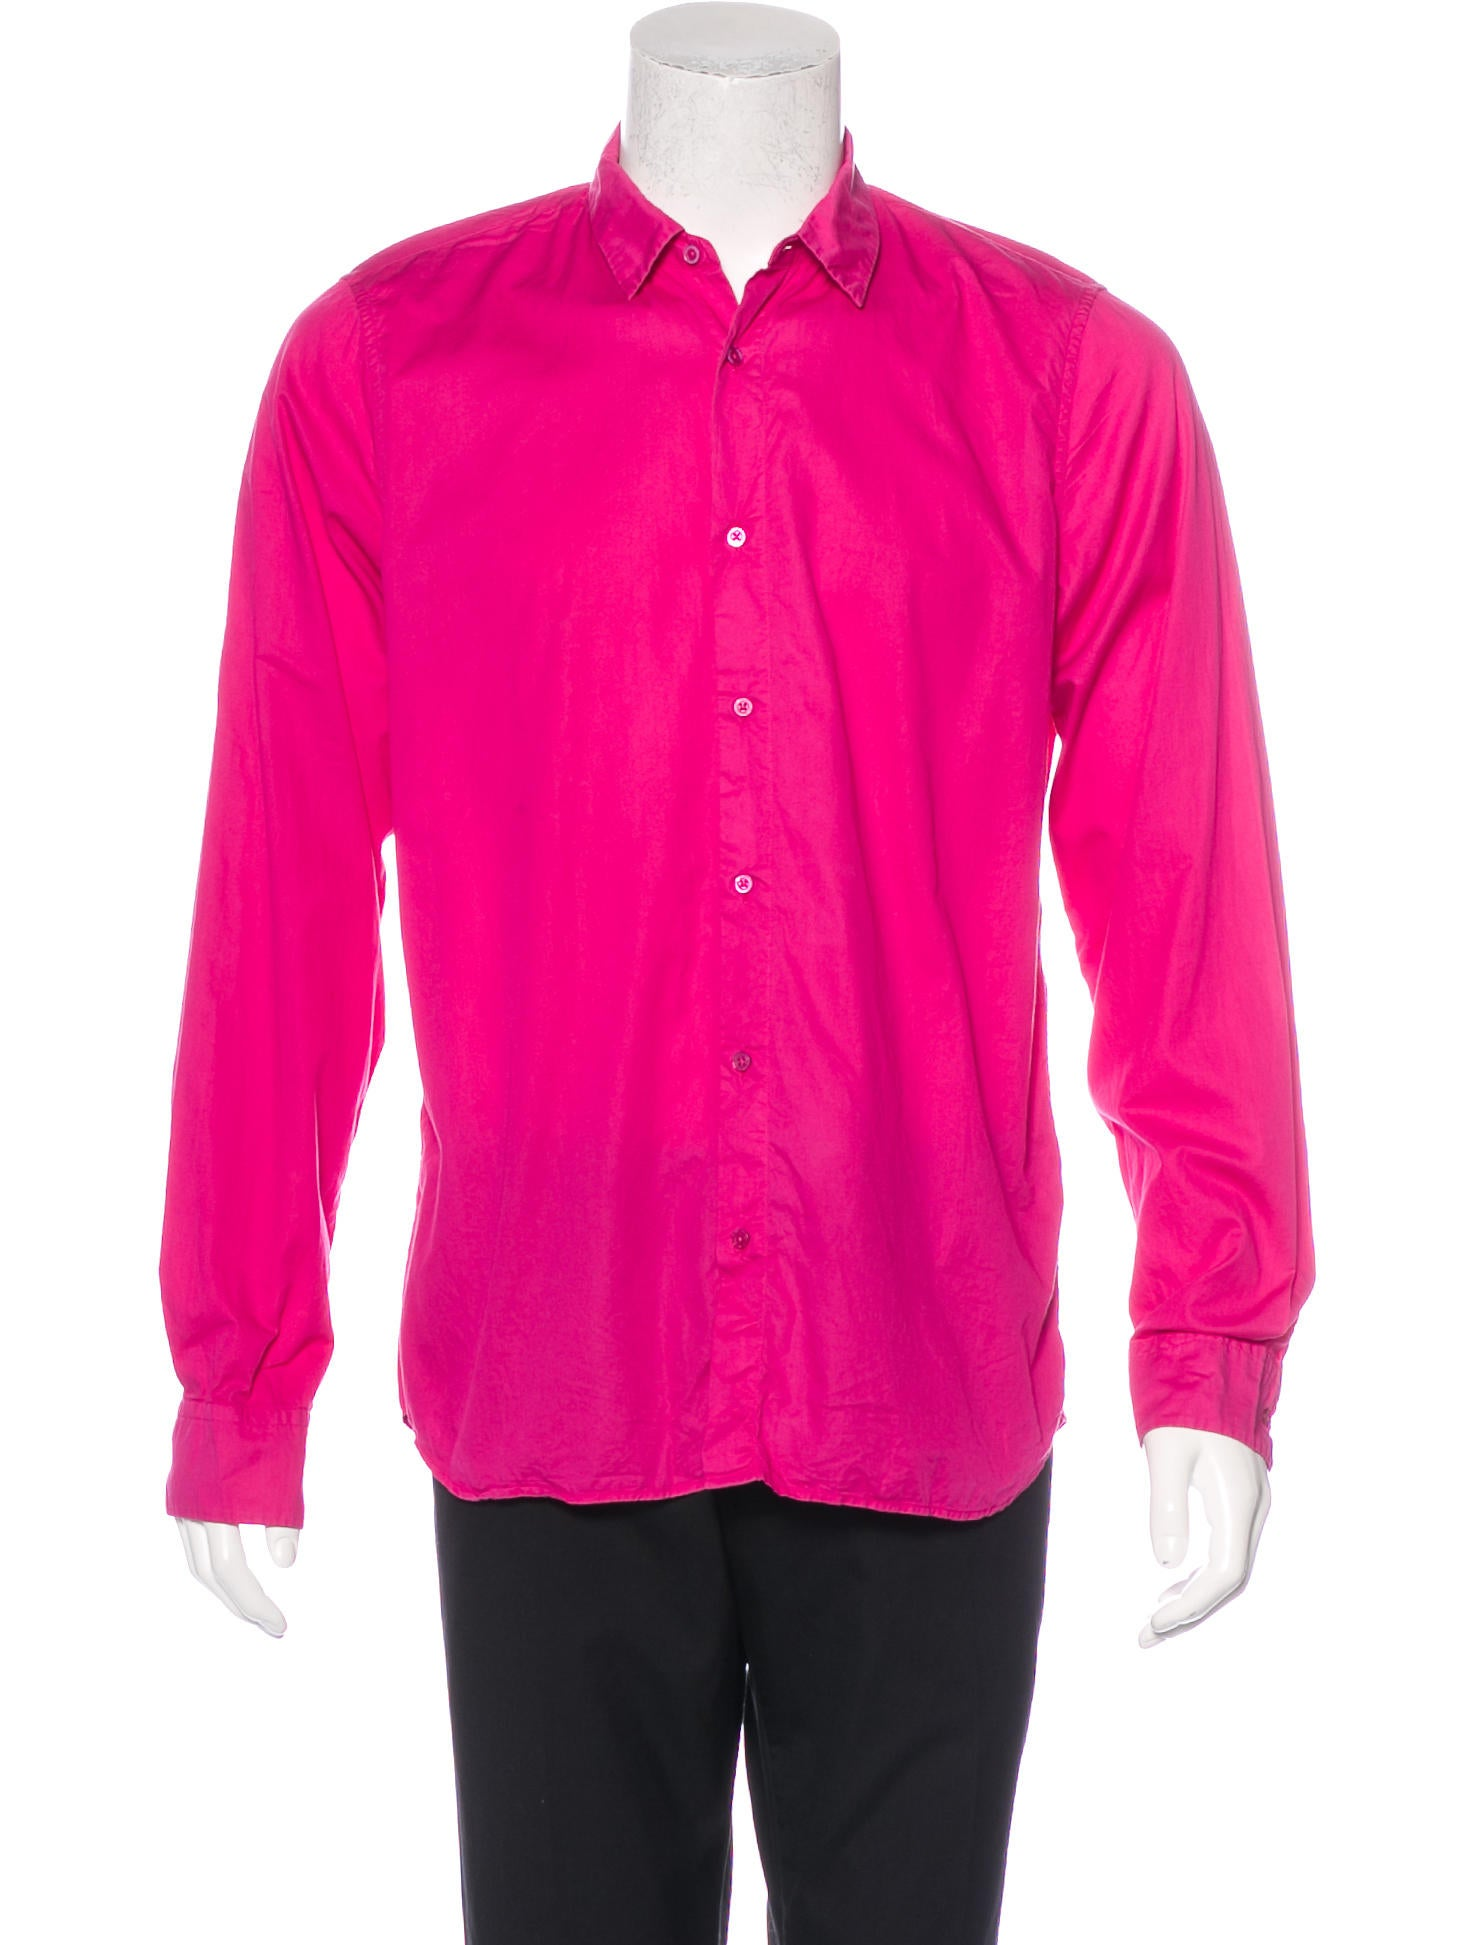 Jil sander woven button up shirt clothing jil37122 for Jil sander mens shirt